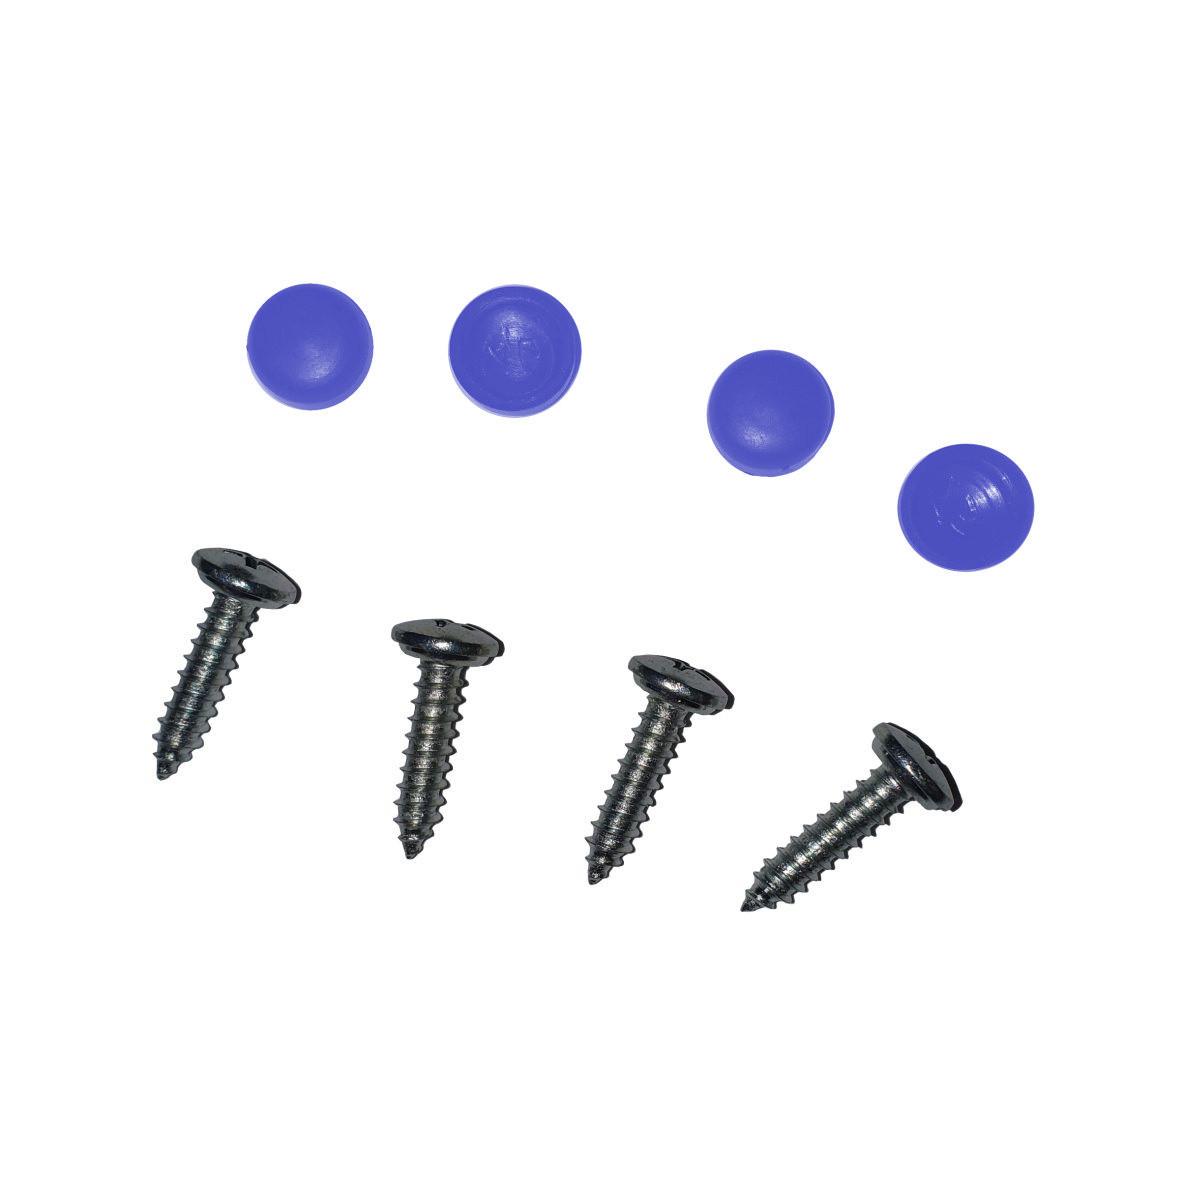 Šroubek na SPZ s plastovým krytem (modrý)